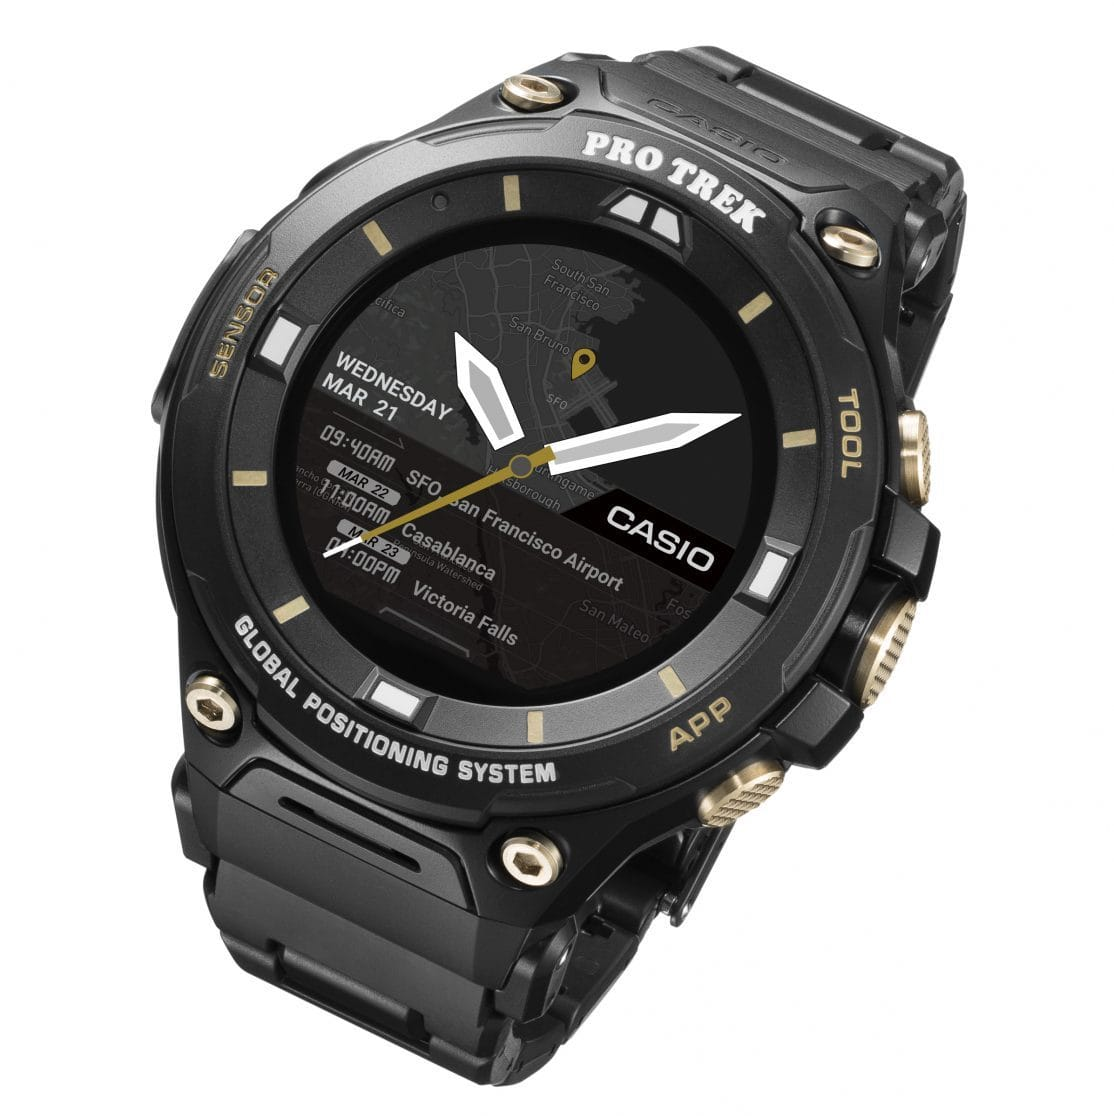 Casio презентовала «умные» часы WSD-F20SC